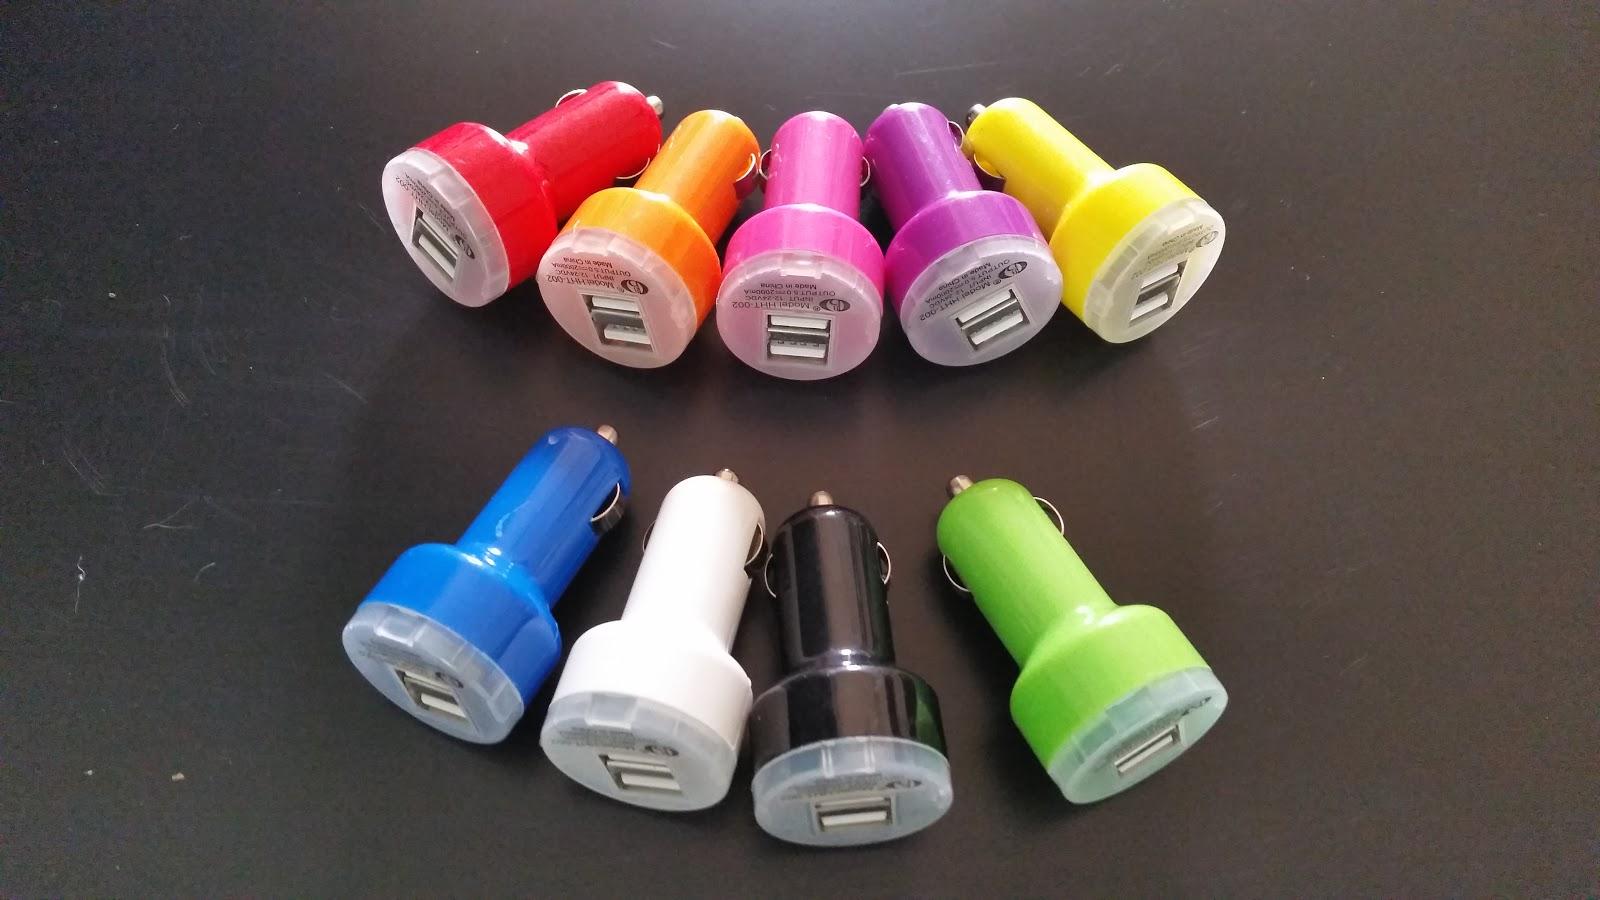 Chargeur Allume cigare de voiture 2 USB 2 câbles smartphone ou MP34 9 couleurs www.avalonlineshopping.com.jpg